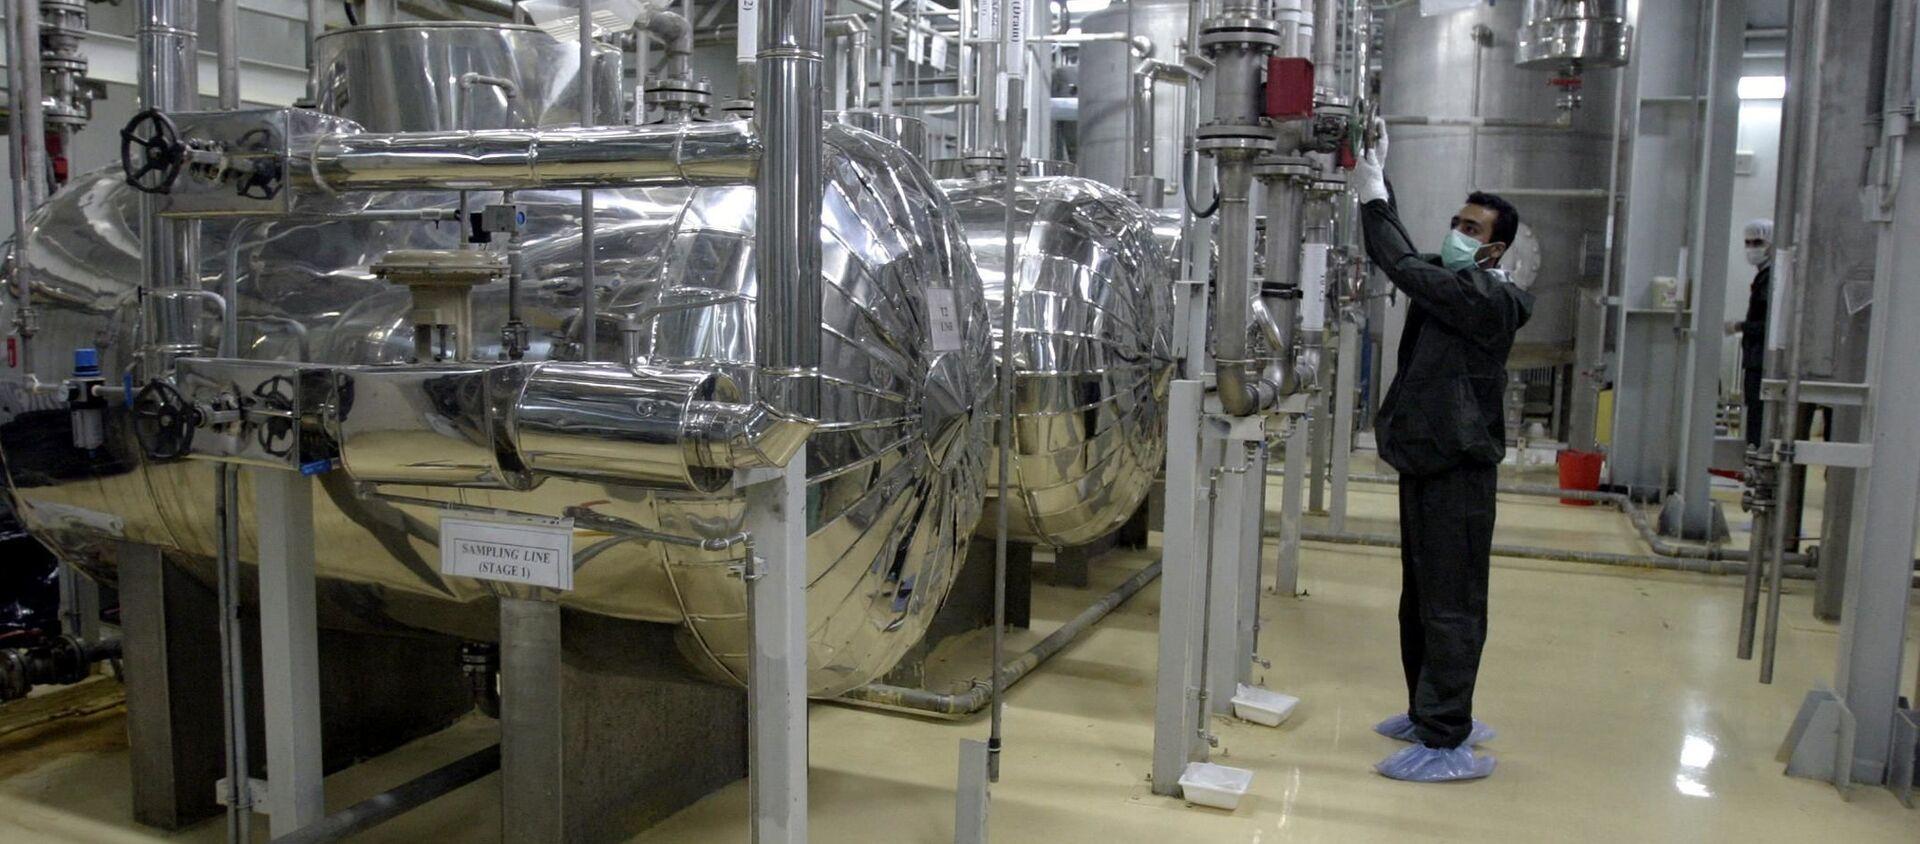 An Iranian technician works at a Uranium Conversion Facility (UCF) in Isfahan 20 November 2004 - Sputnik International, 1920, 05.07.2021